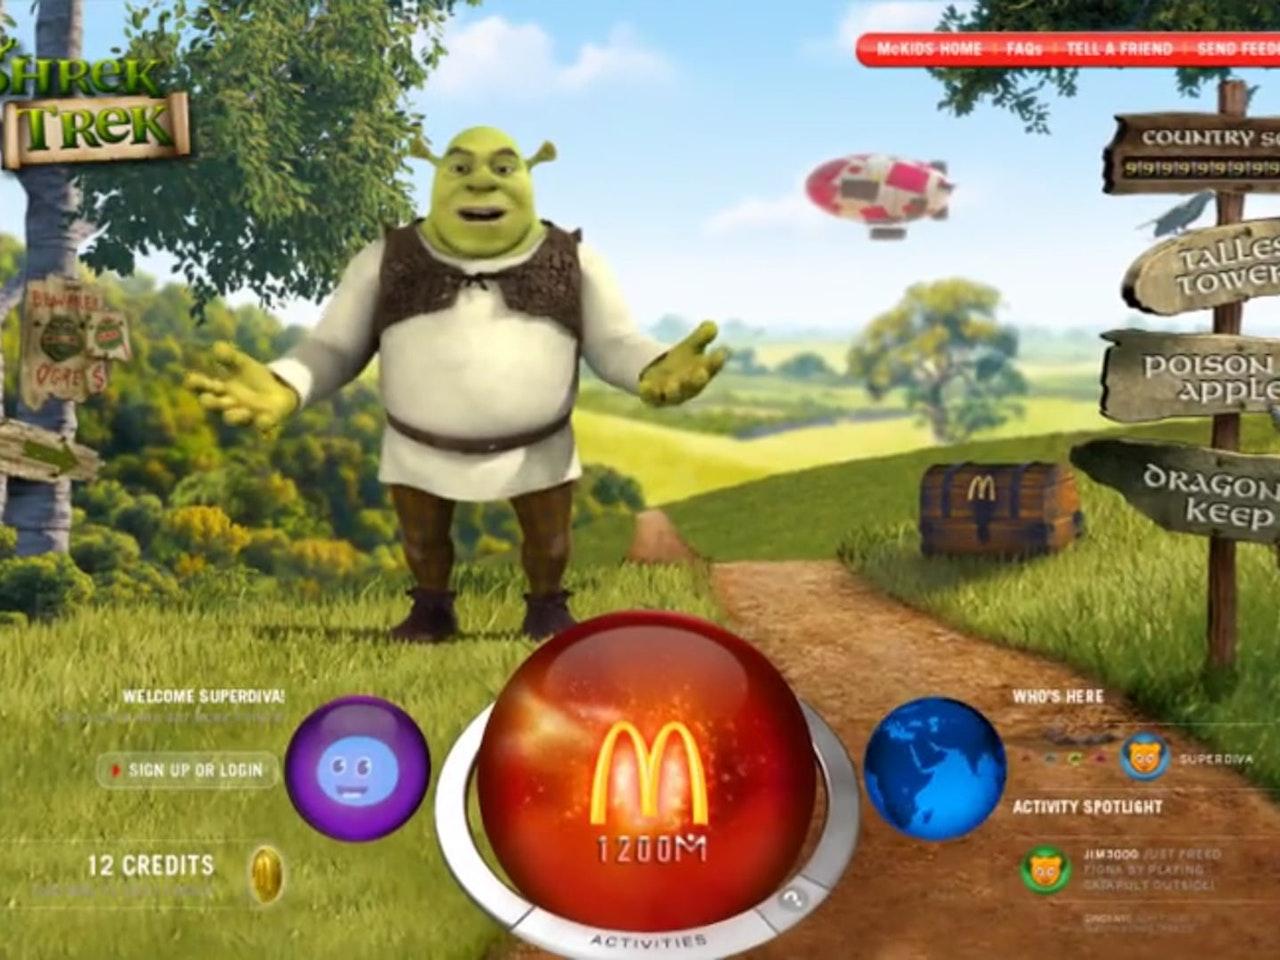 Shrek' Treketh to Adventure!